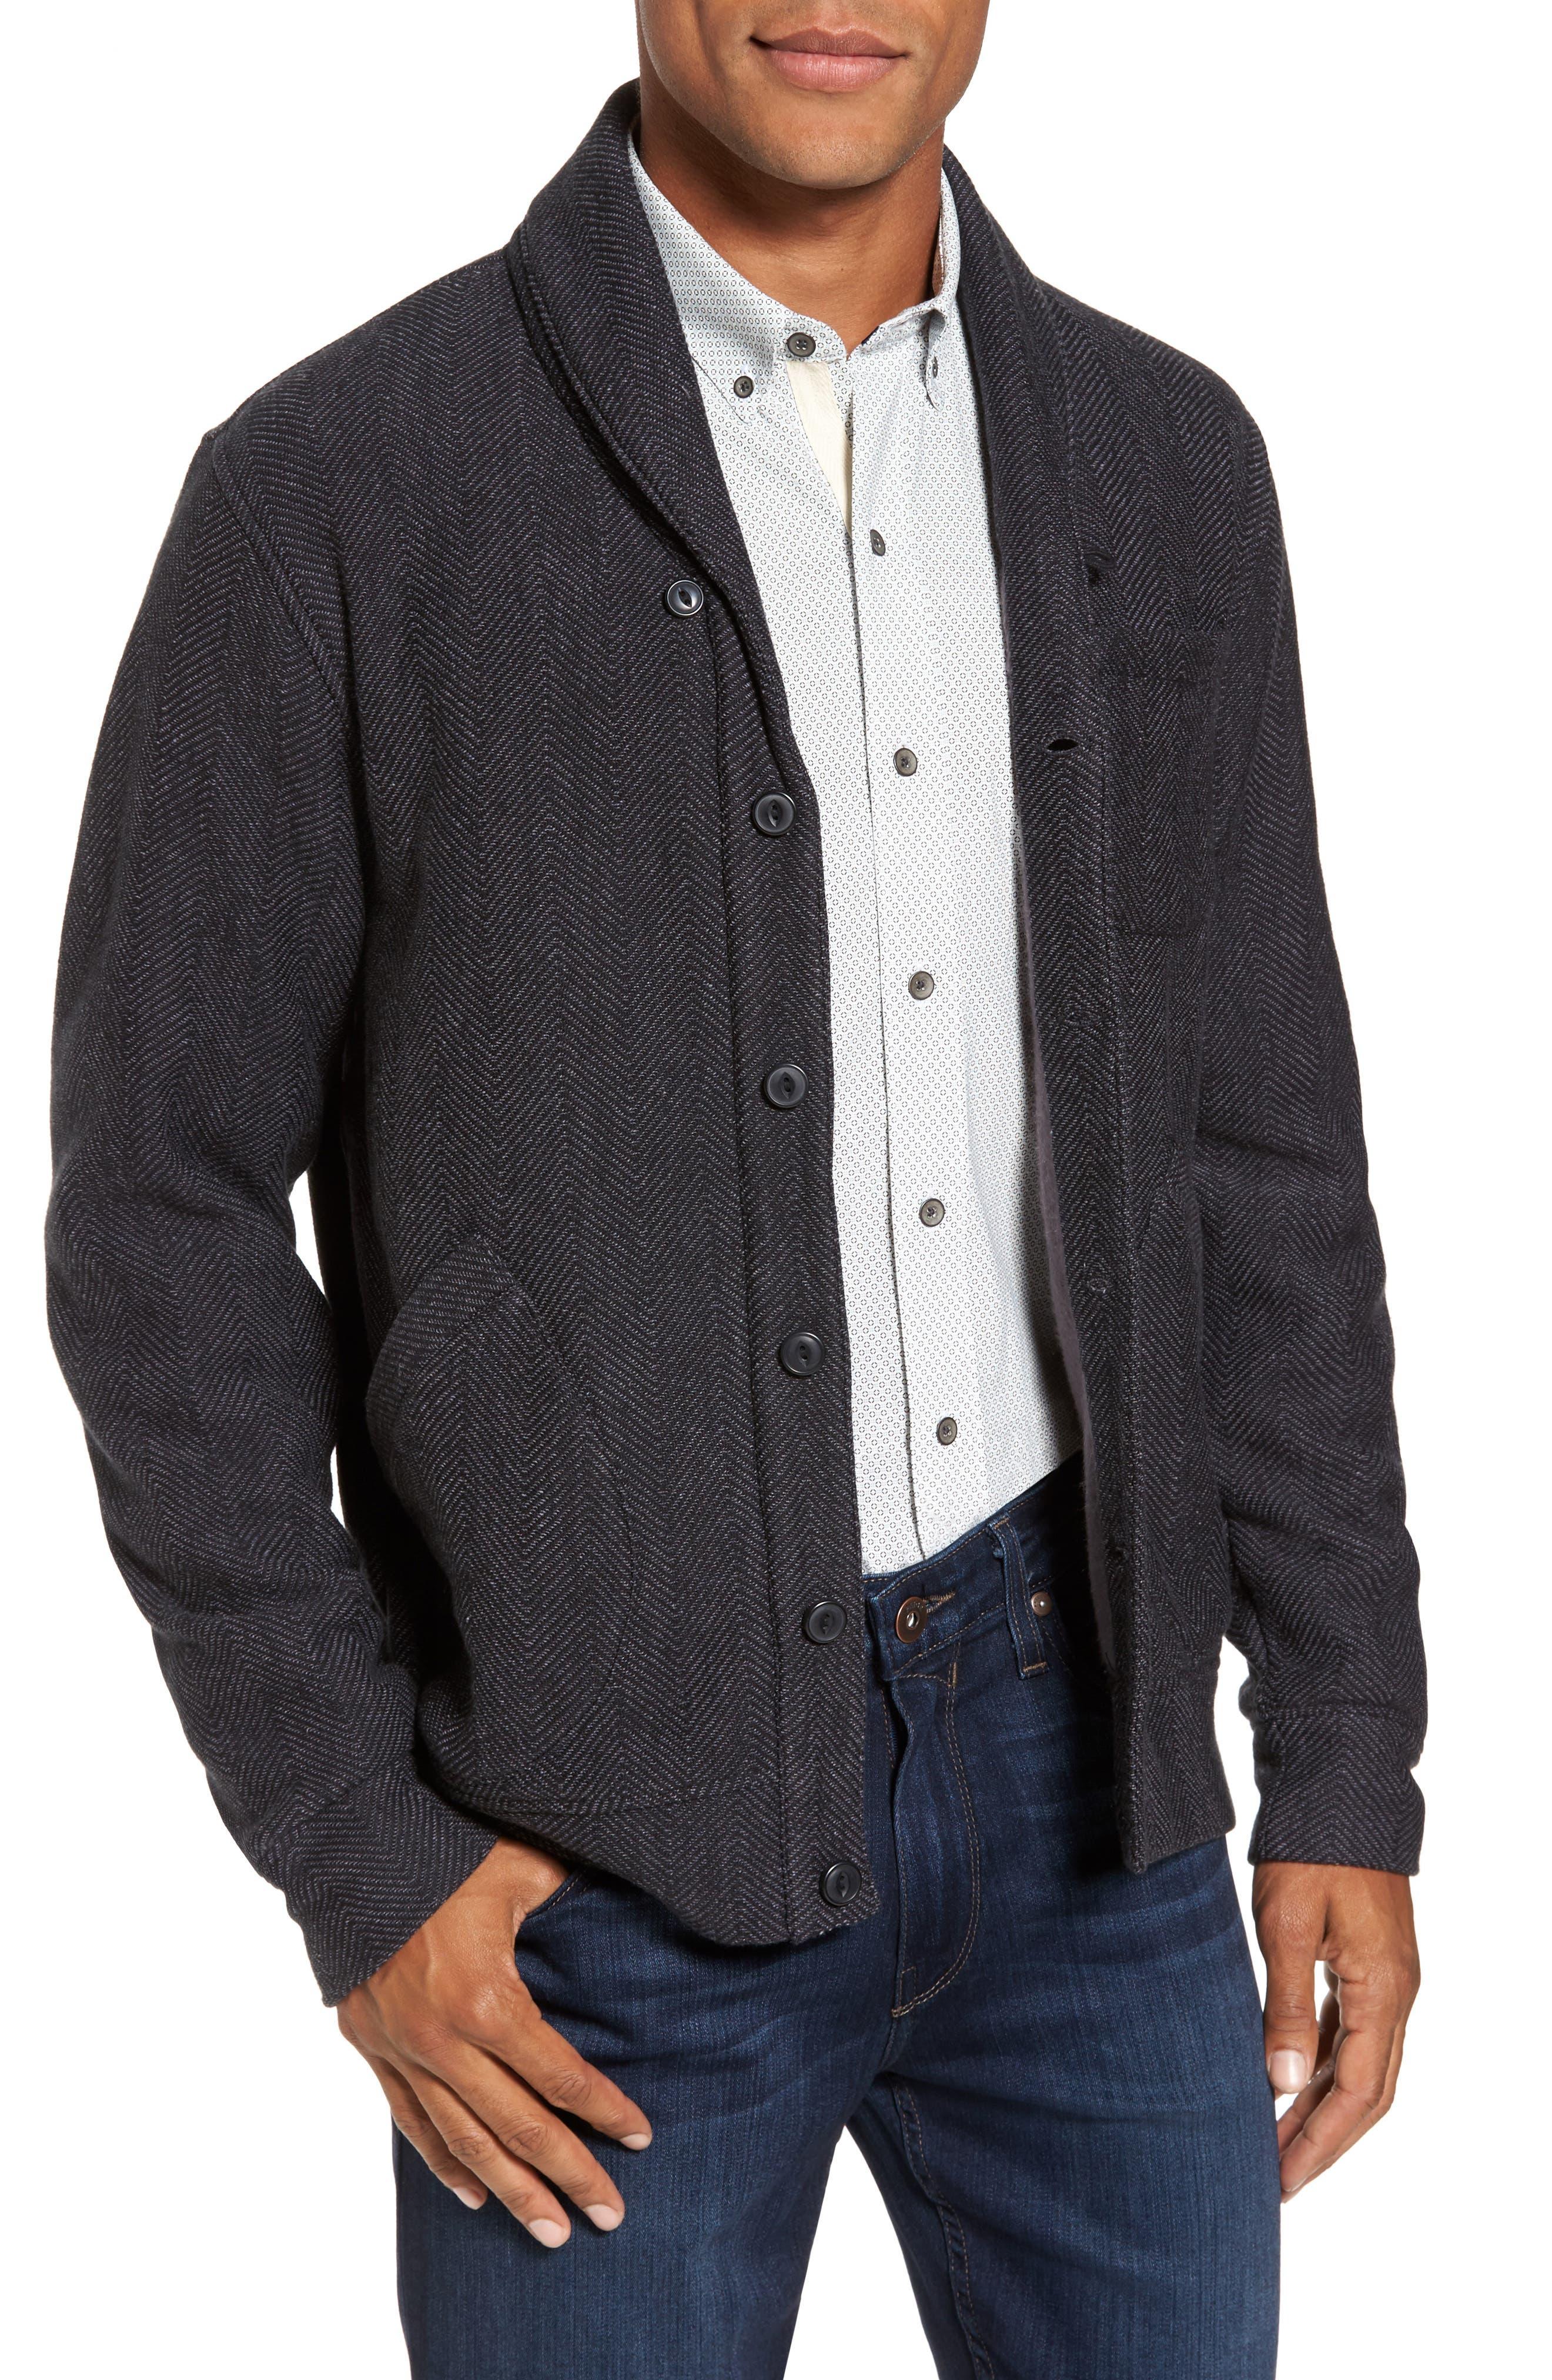 Main Image - Nordstrom Men's Shop Fleece Lined Shawl Collar Cardigan